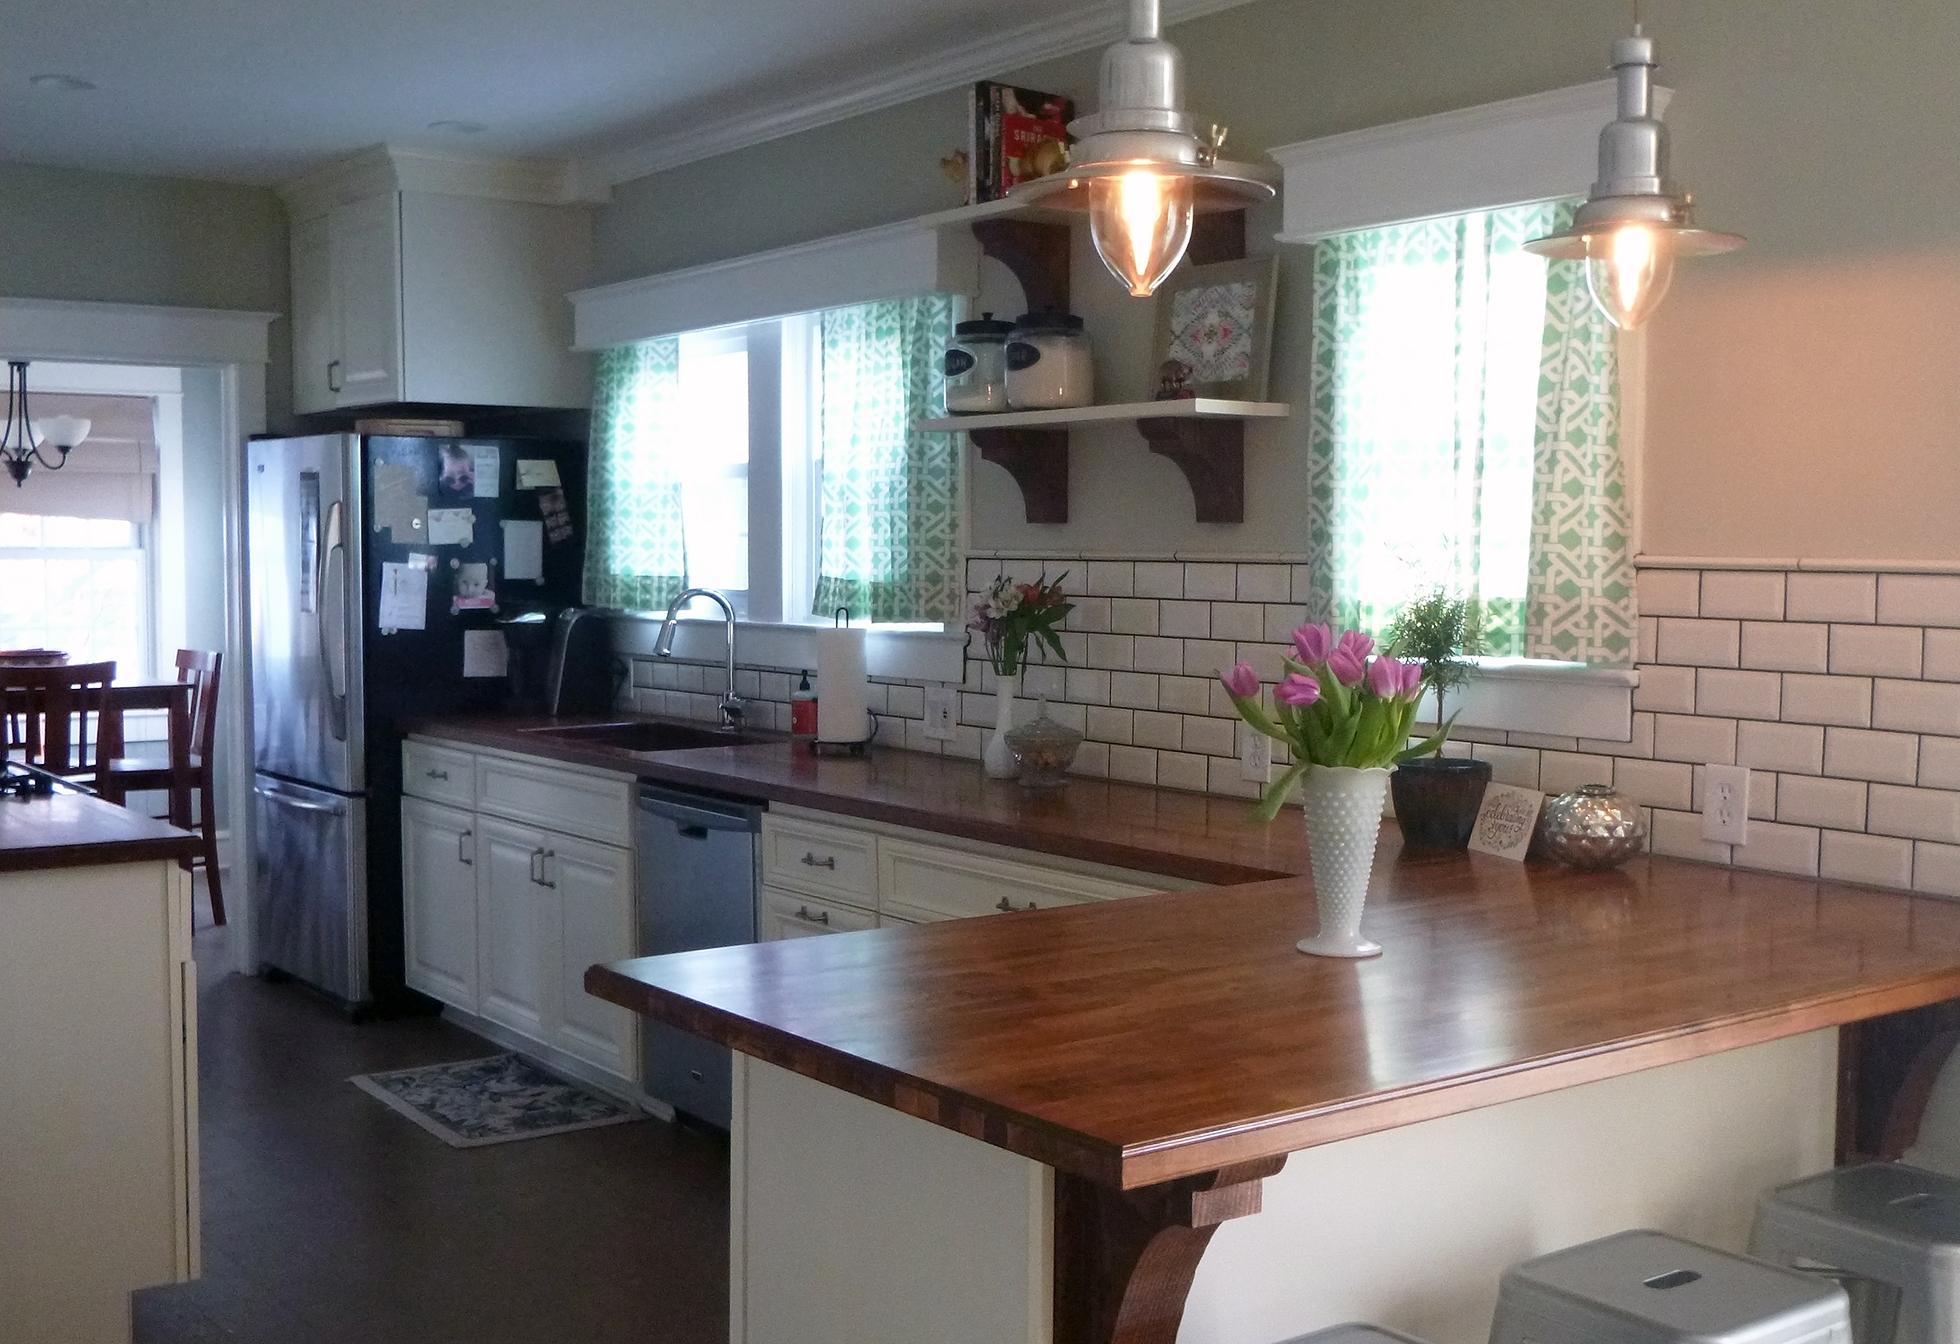 Transitional kitchen with a subway tile backsplash